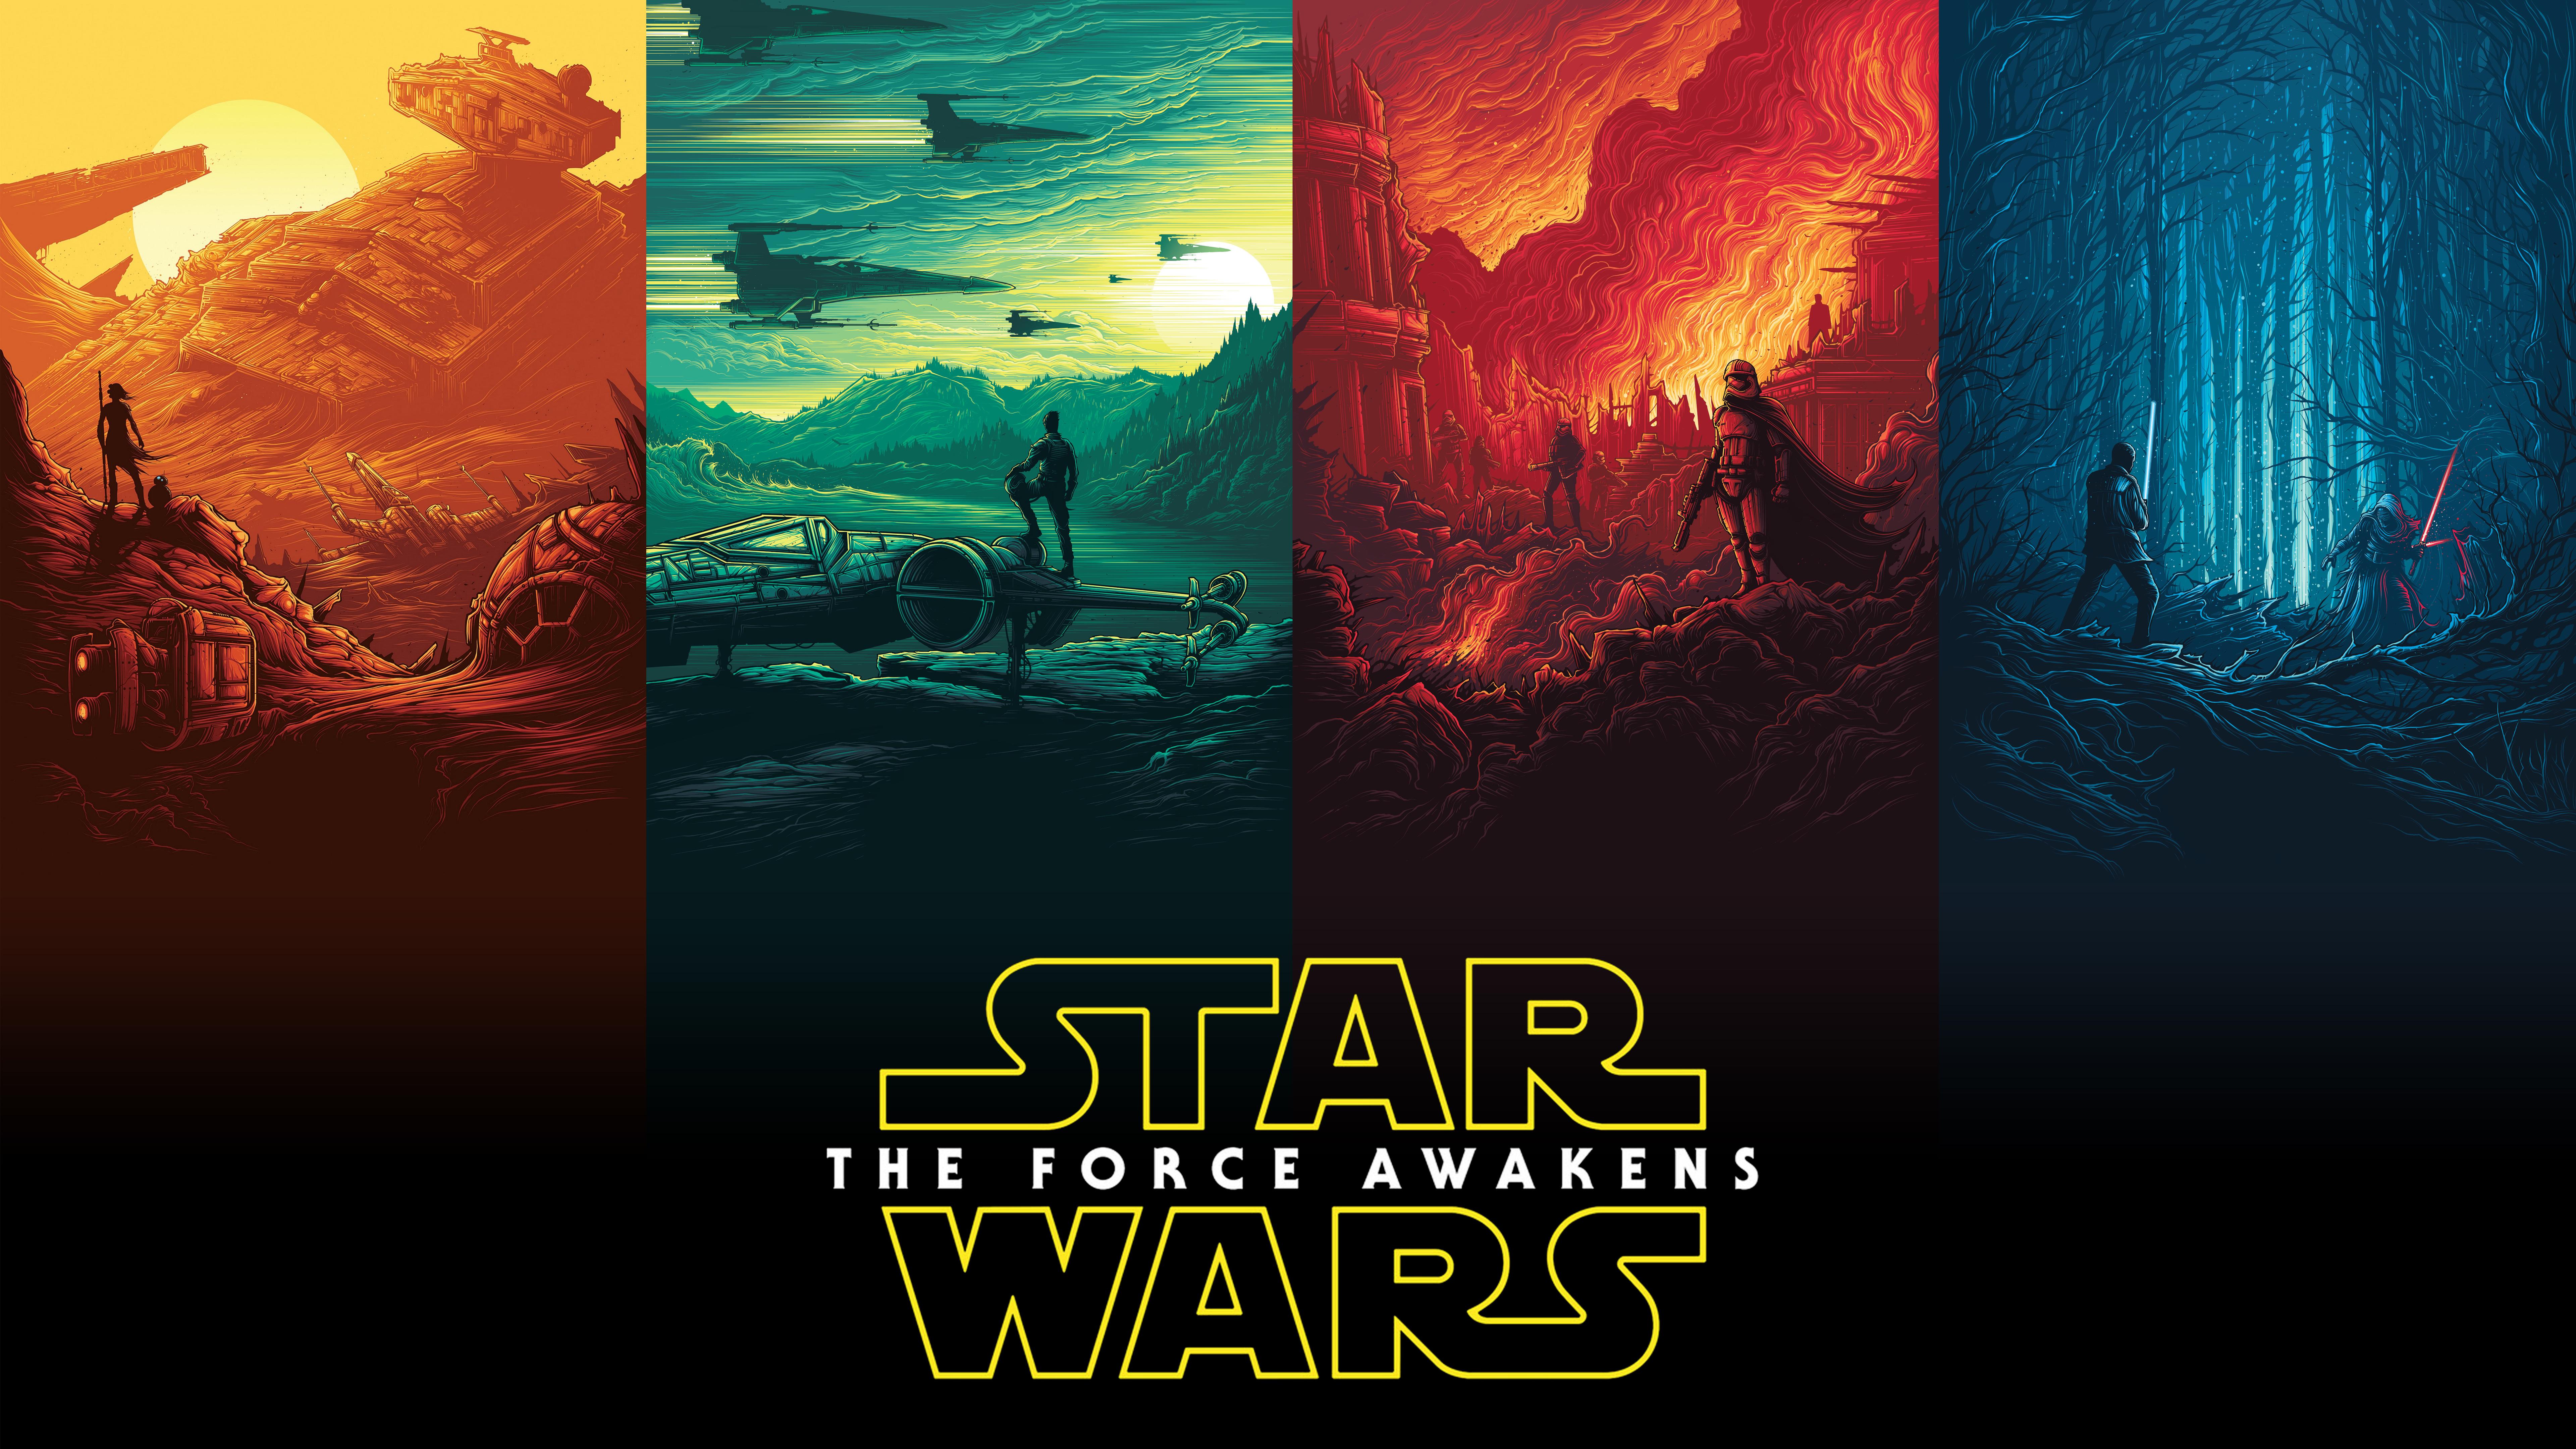 Wallpaper Star Wars Star Wars The Force Awakens Movie Poster Film Posters 7680x4320 Hamouza105 1159543 Hd Wallpapers Wallhere